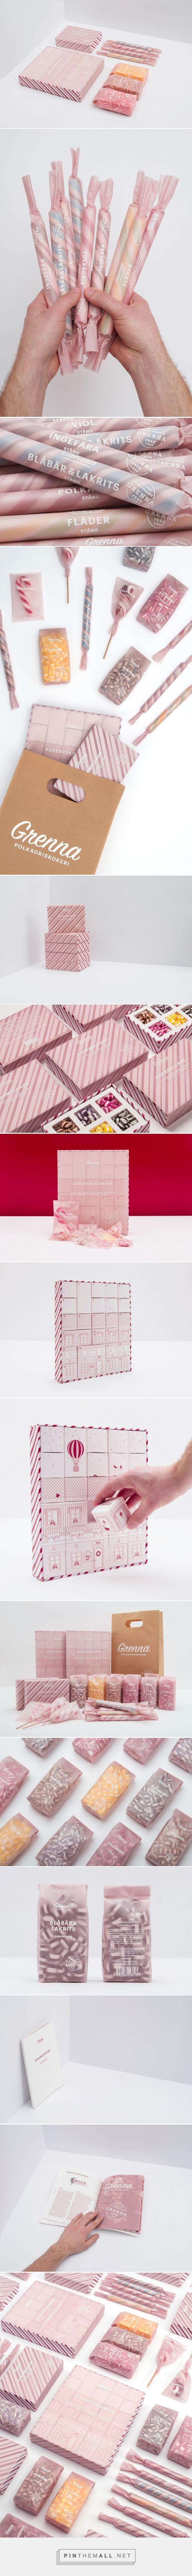 packaging design inspiration